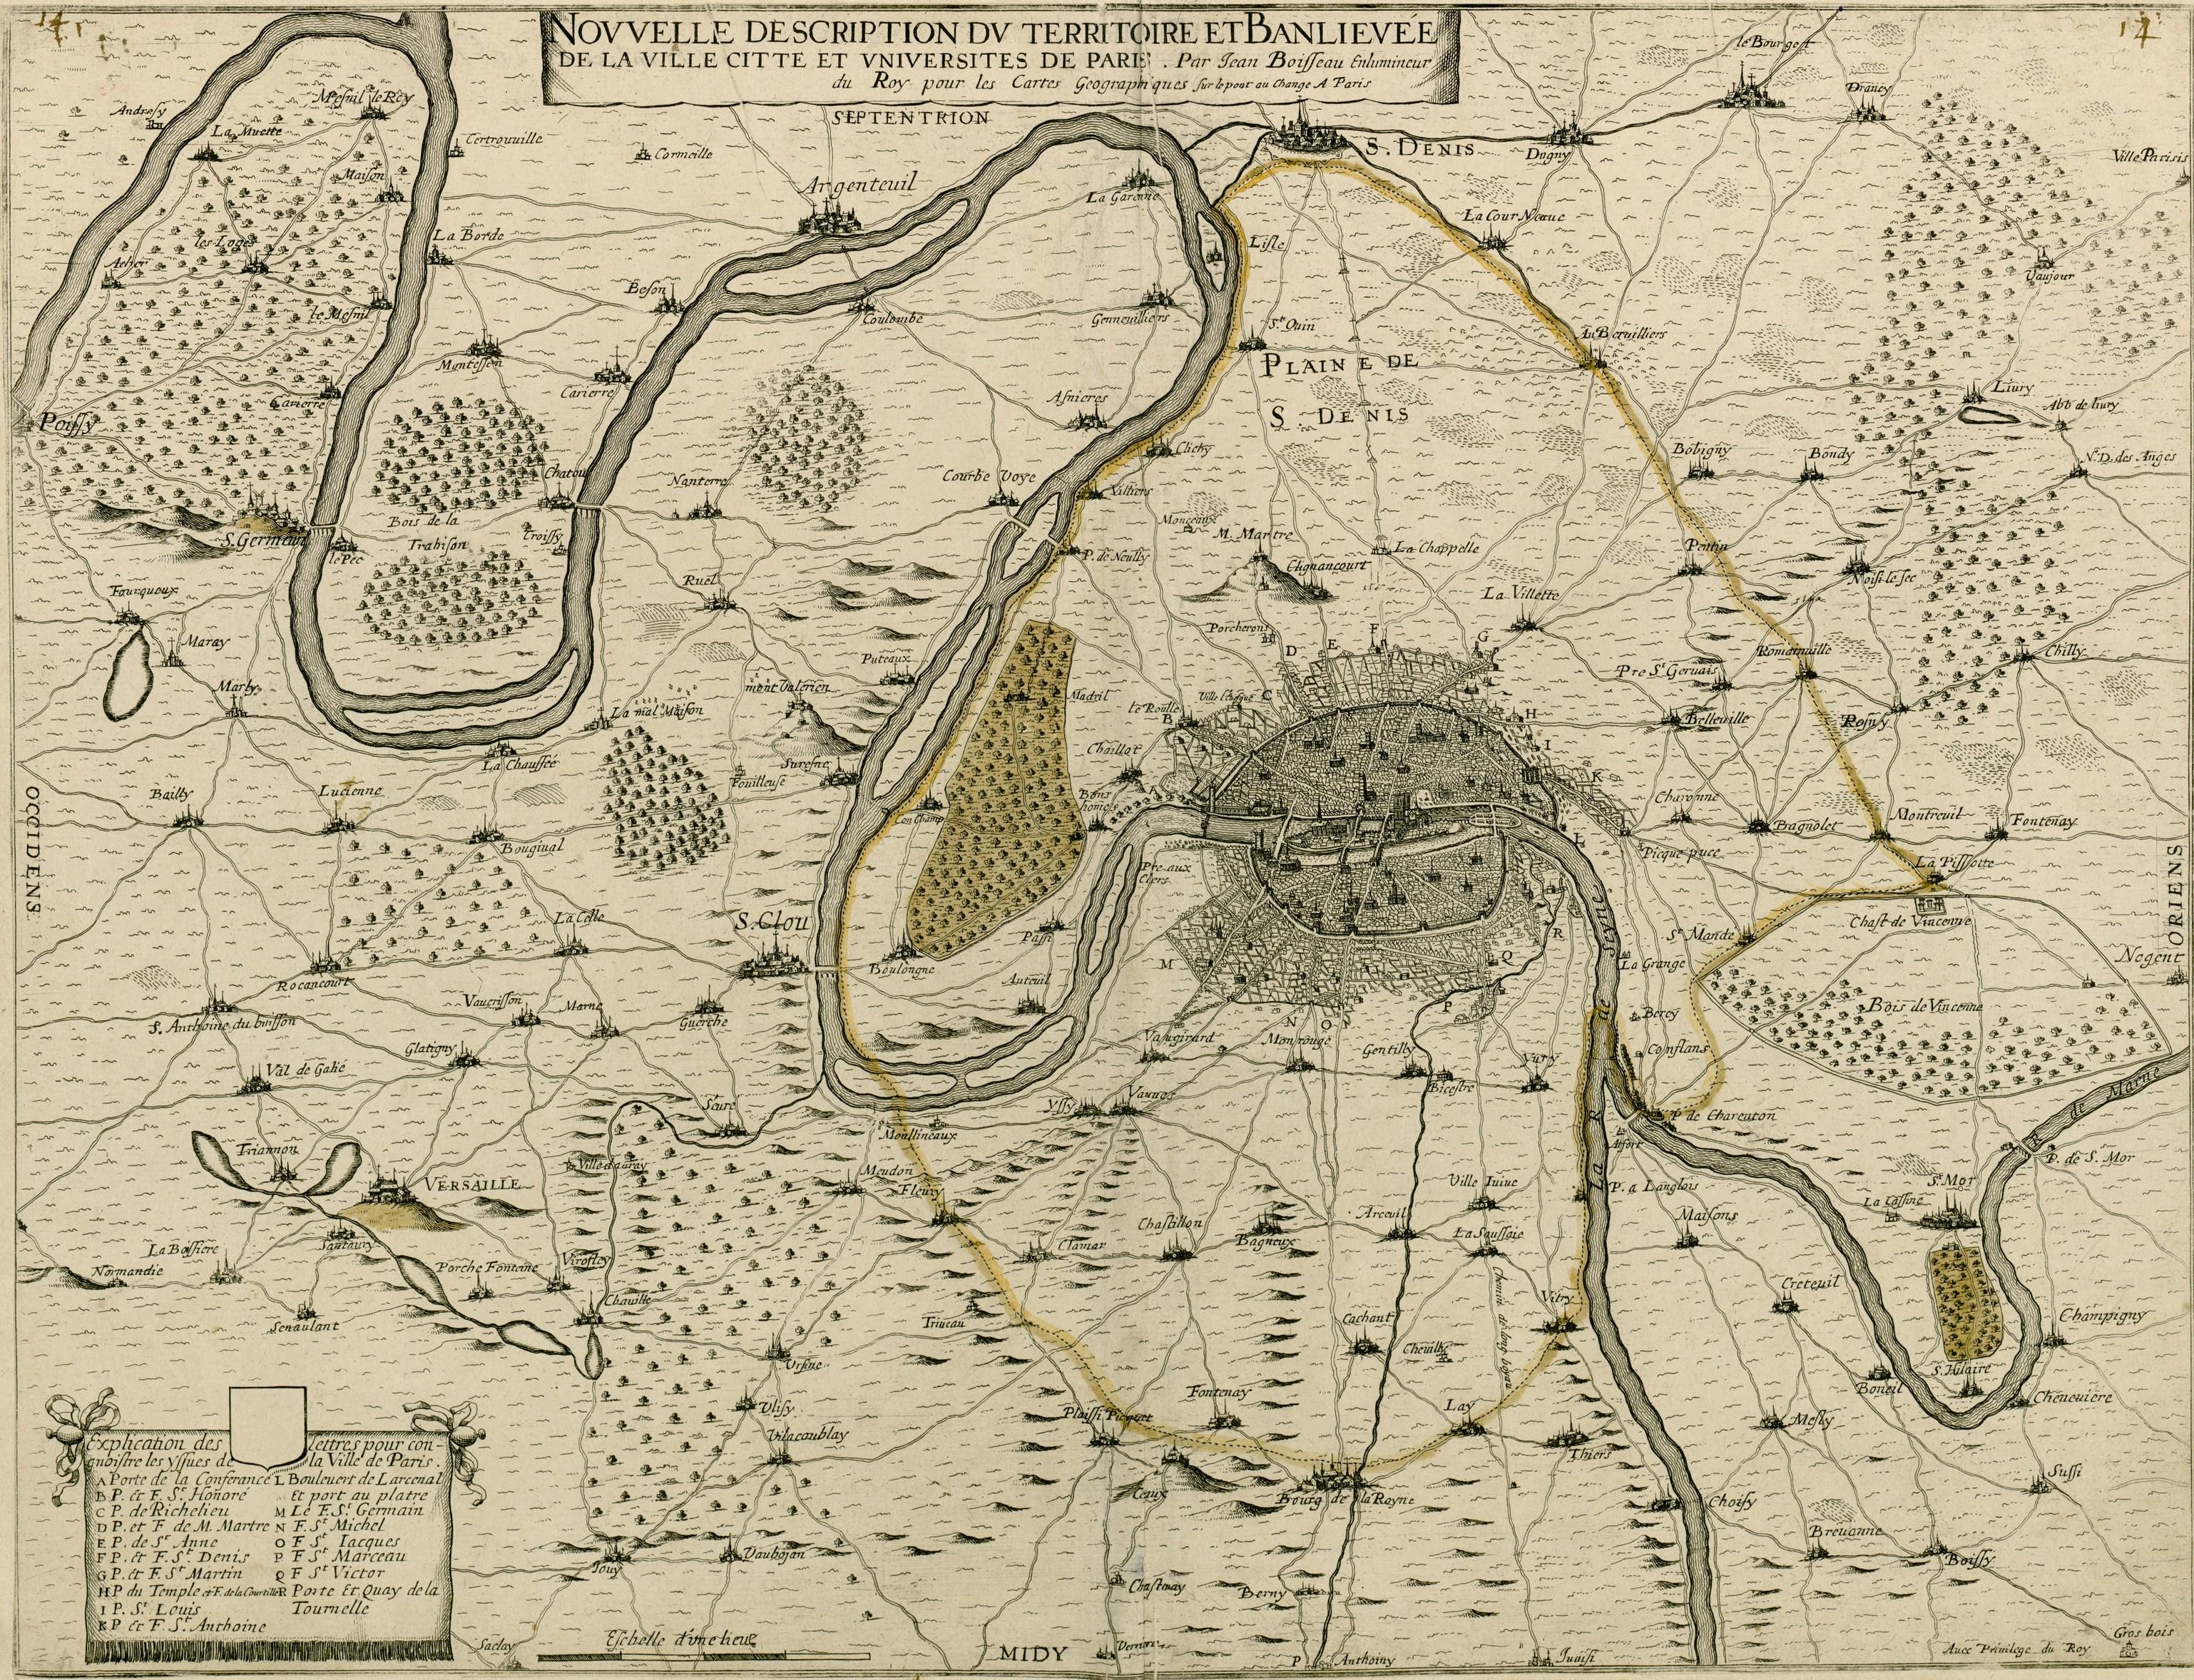 Plan de Paris et sa Banlieue en 1645.